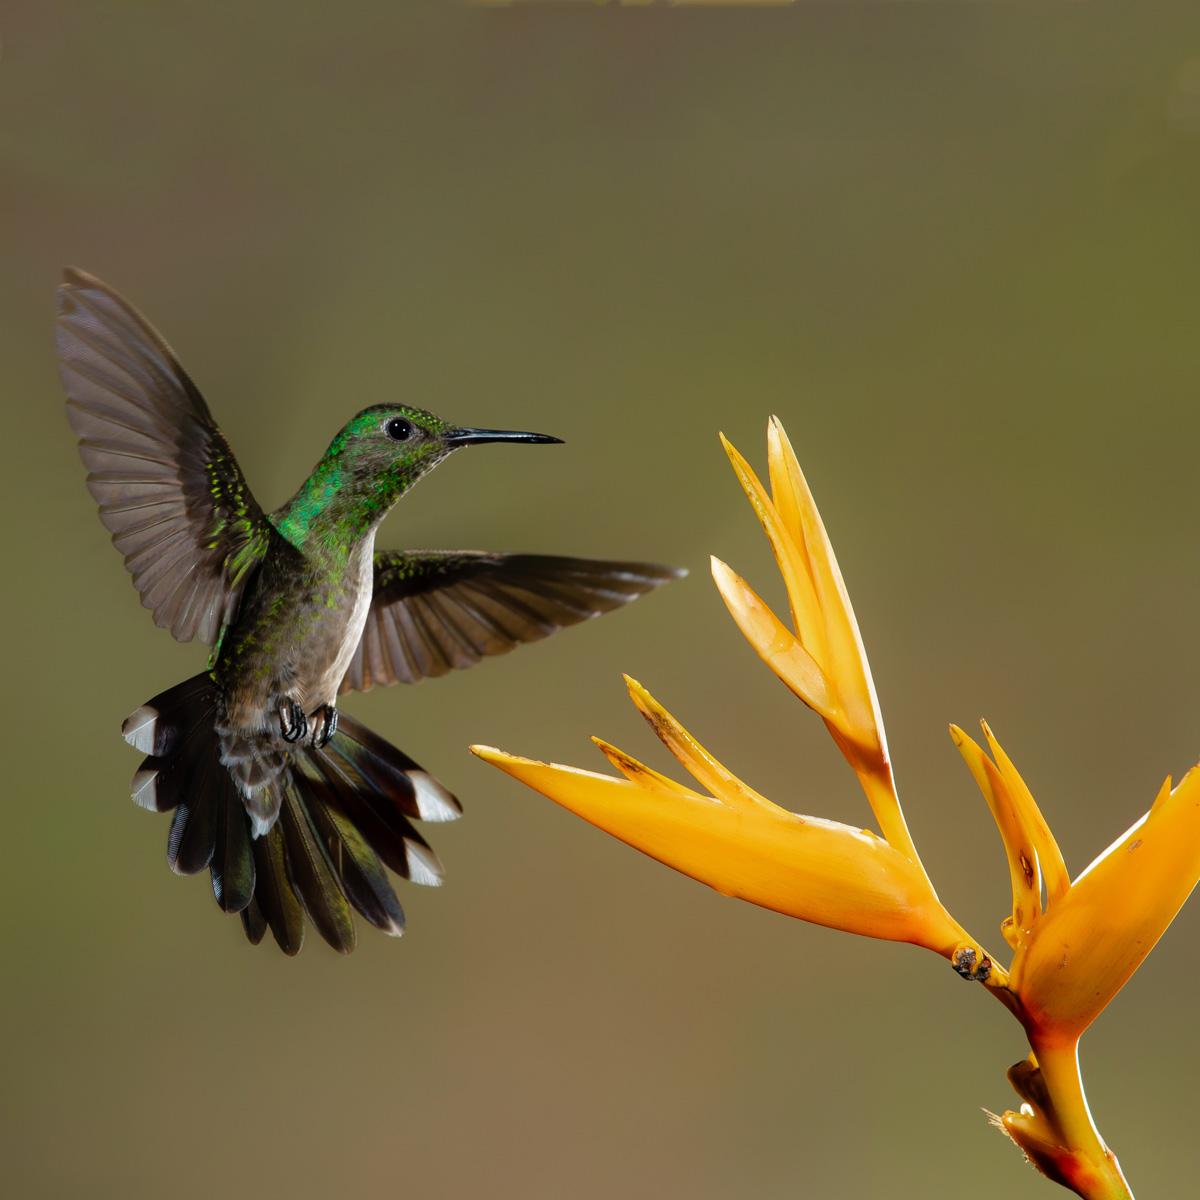 Costa Rica © Zdenek Machacek | unsplash